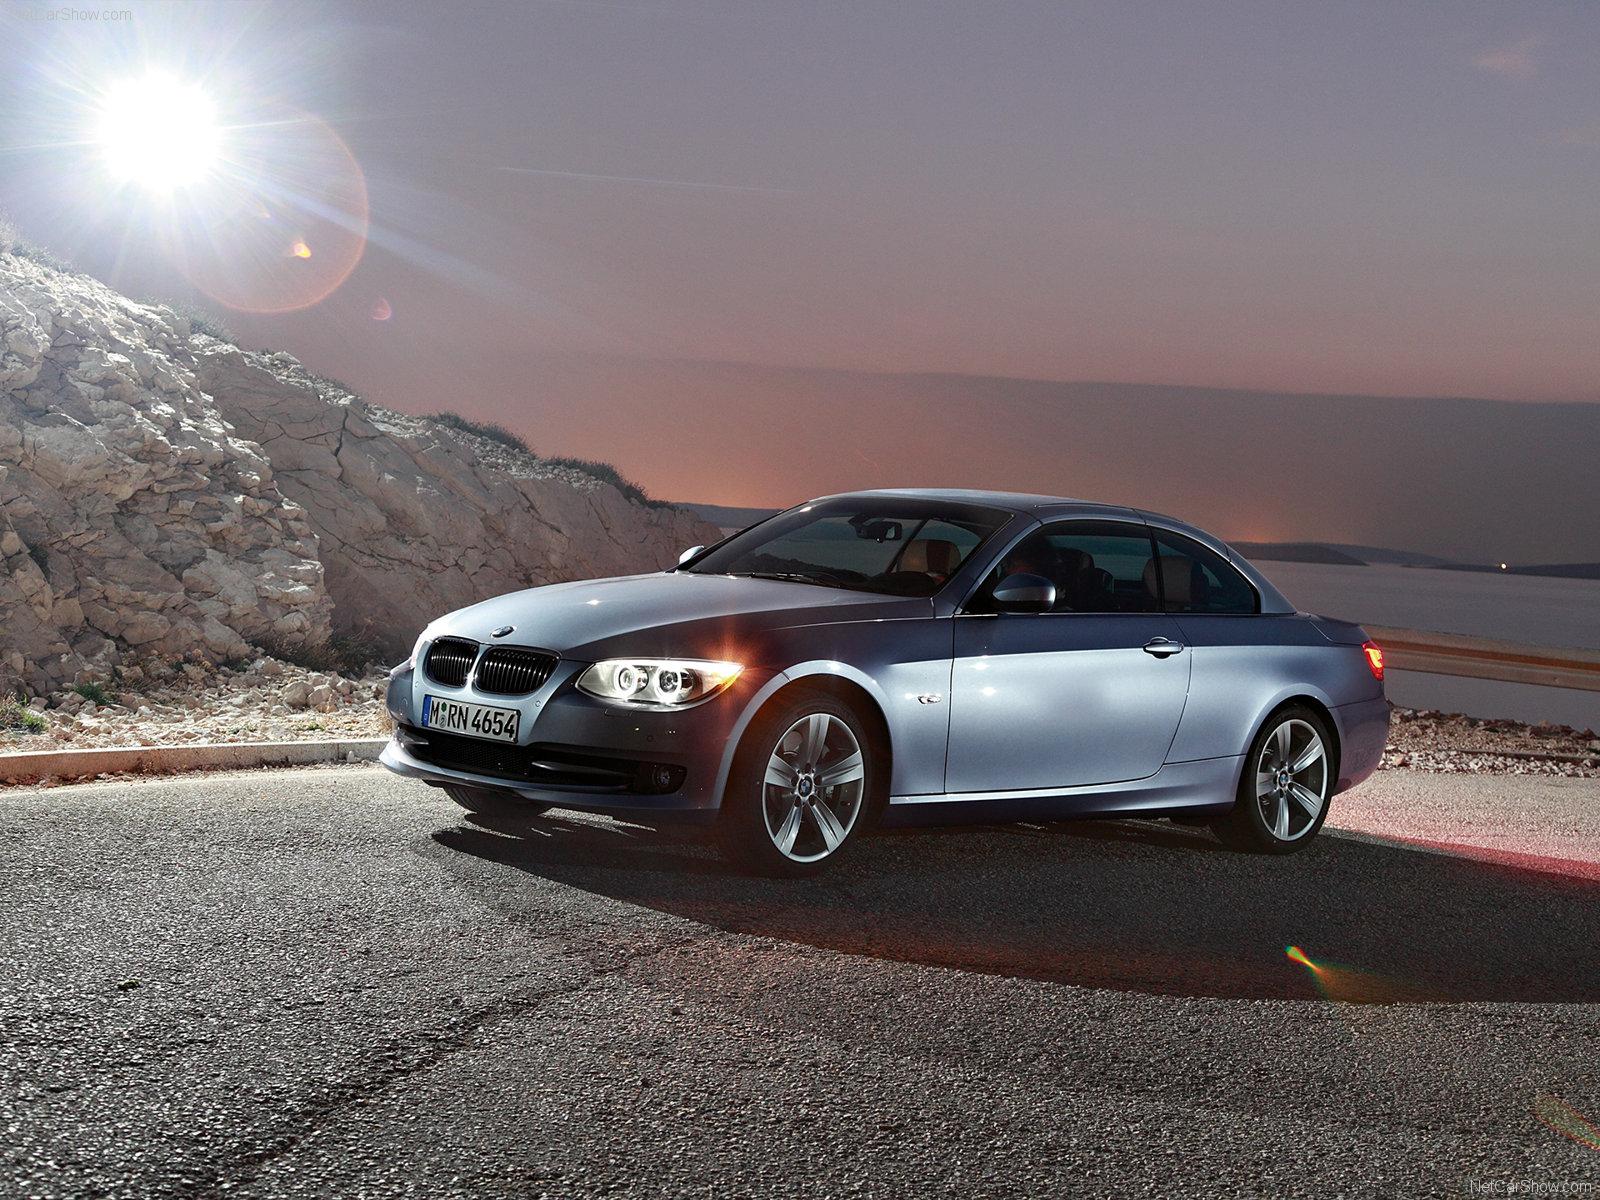 BMW 3-series E93 Convertible photo 70697